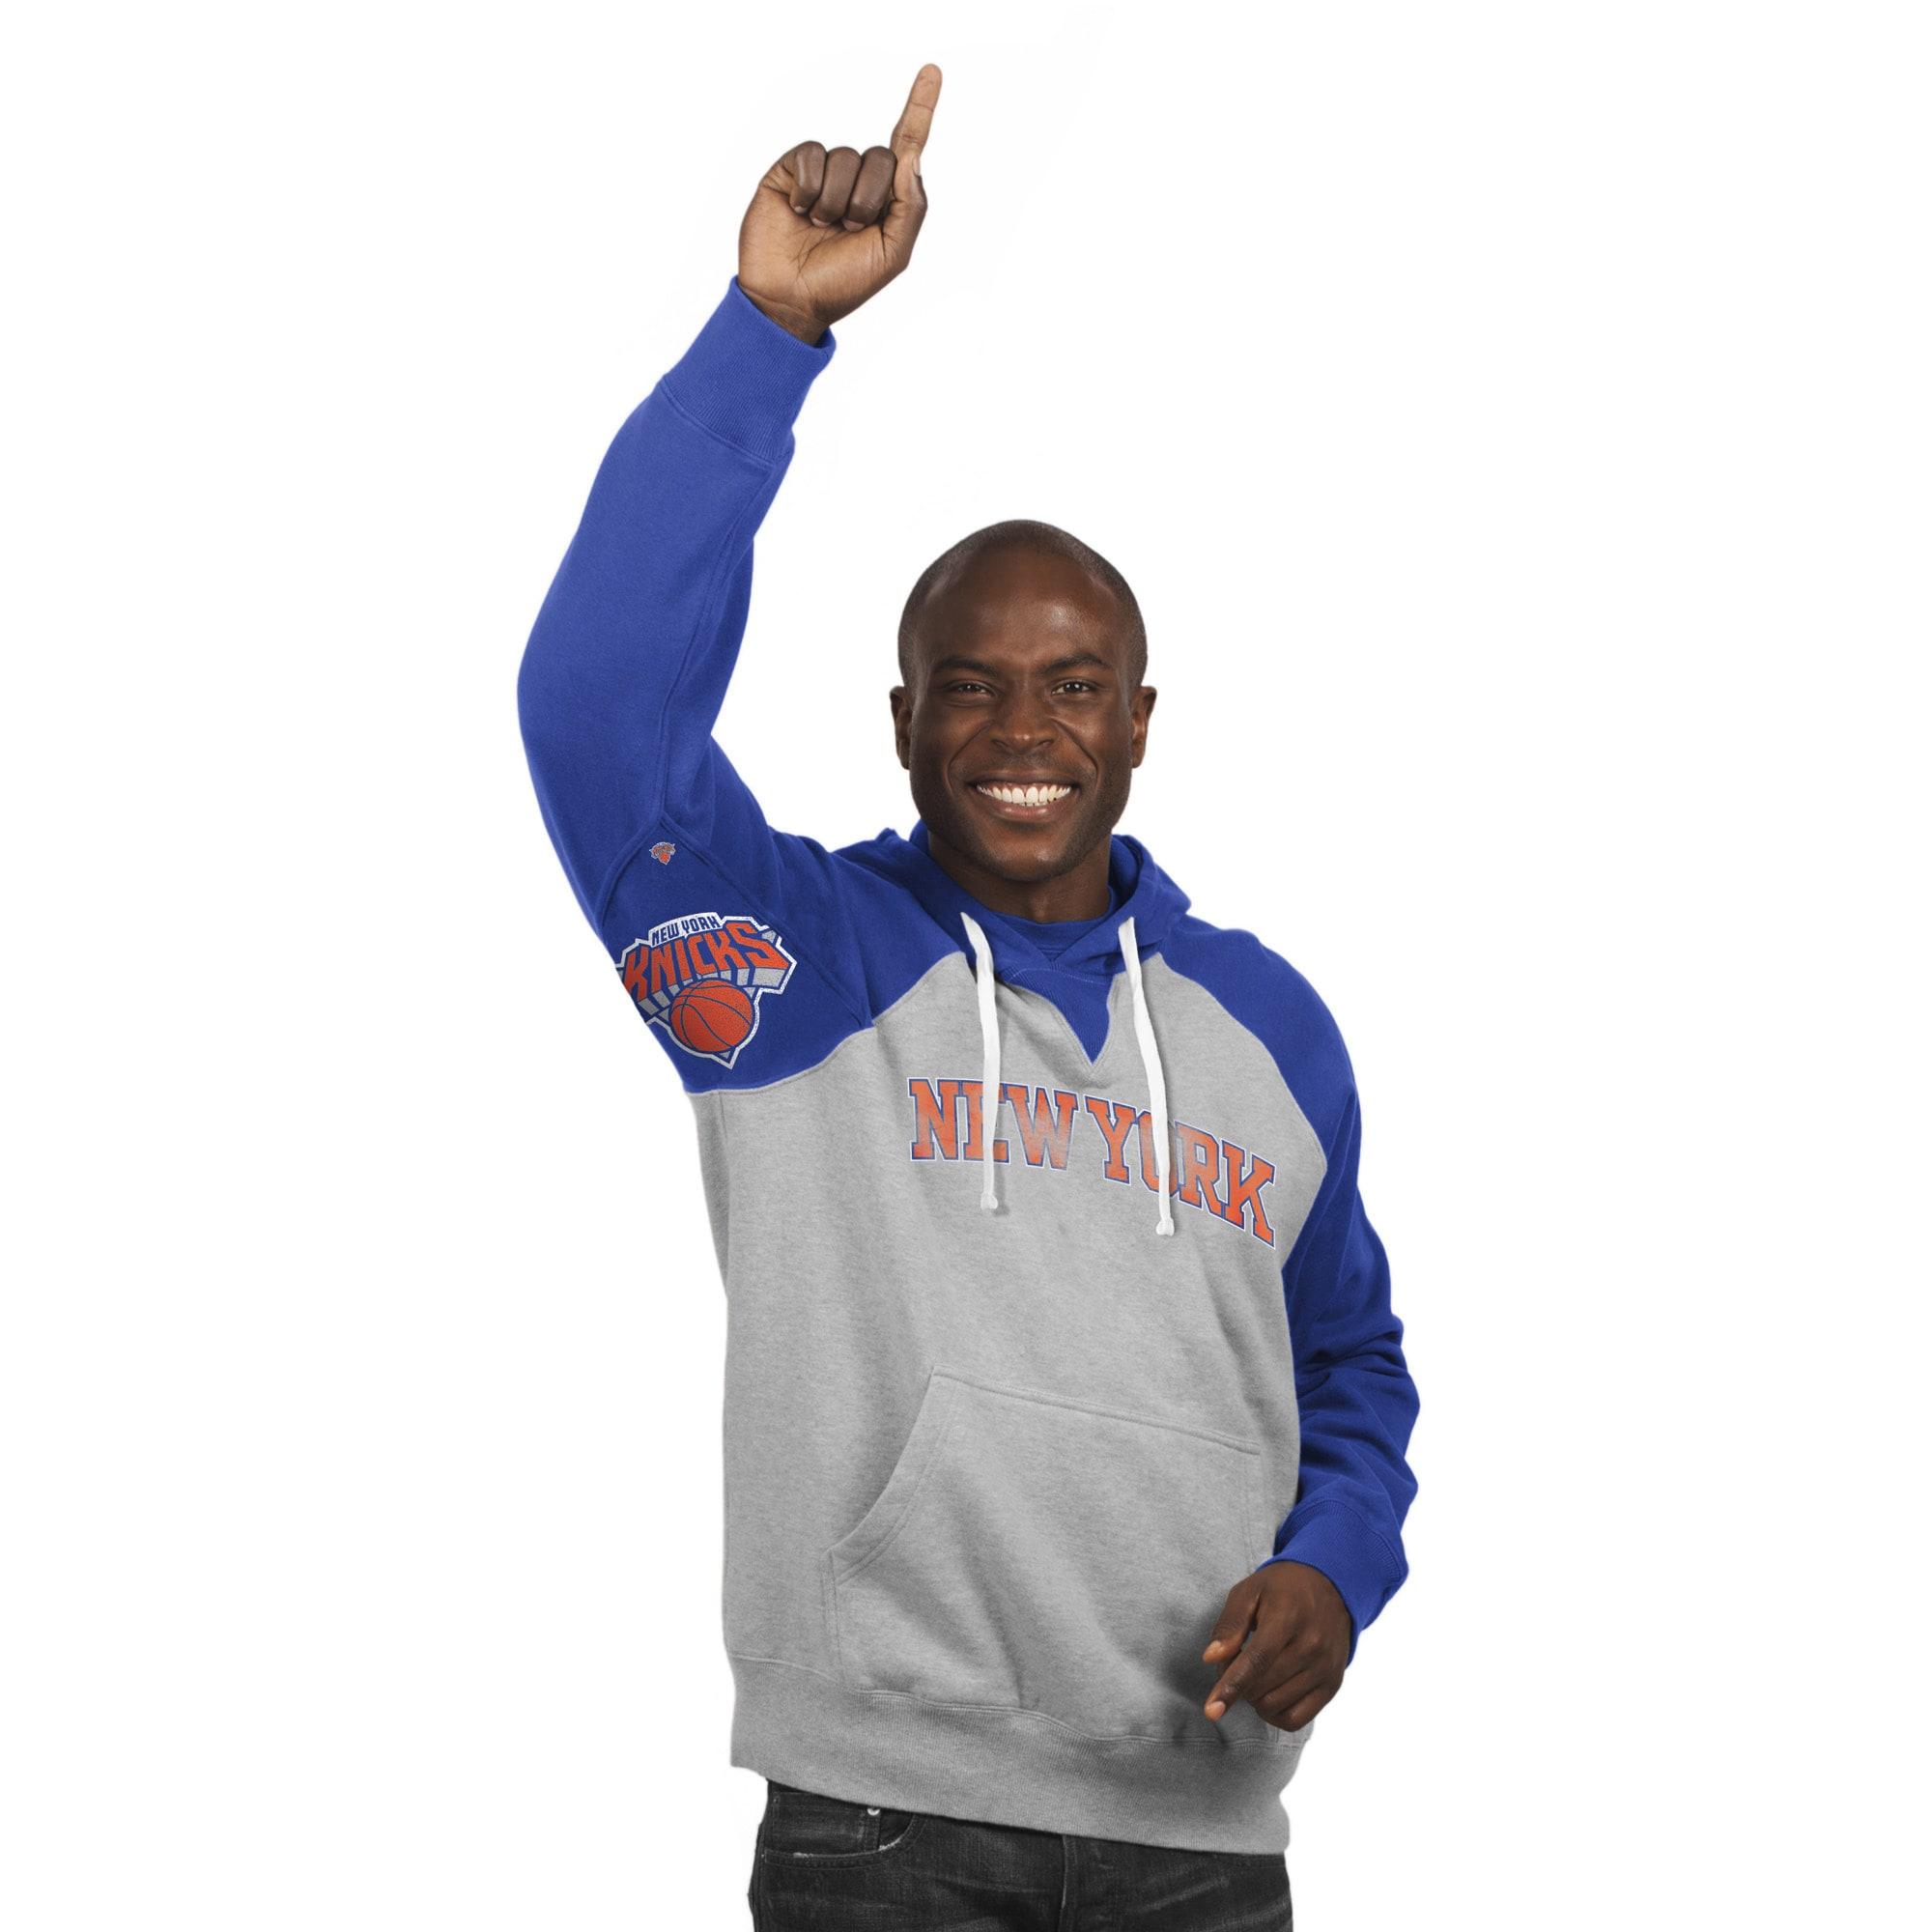 New York Knicks Hands High Pullover Hoodie - Gray